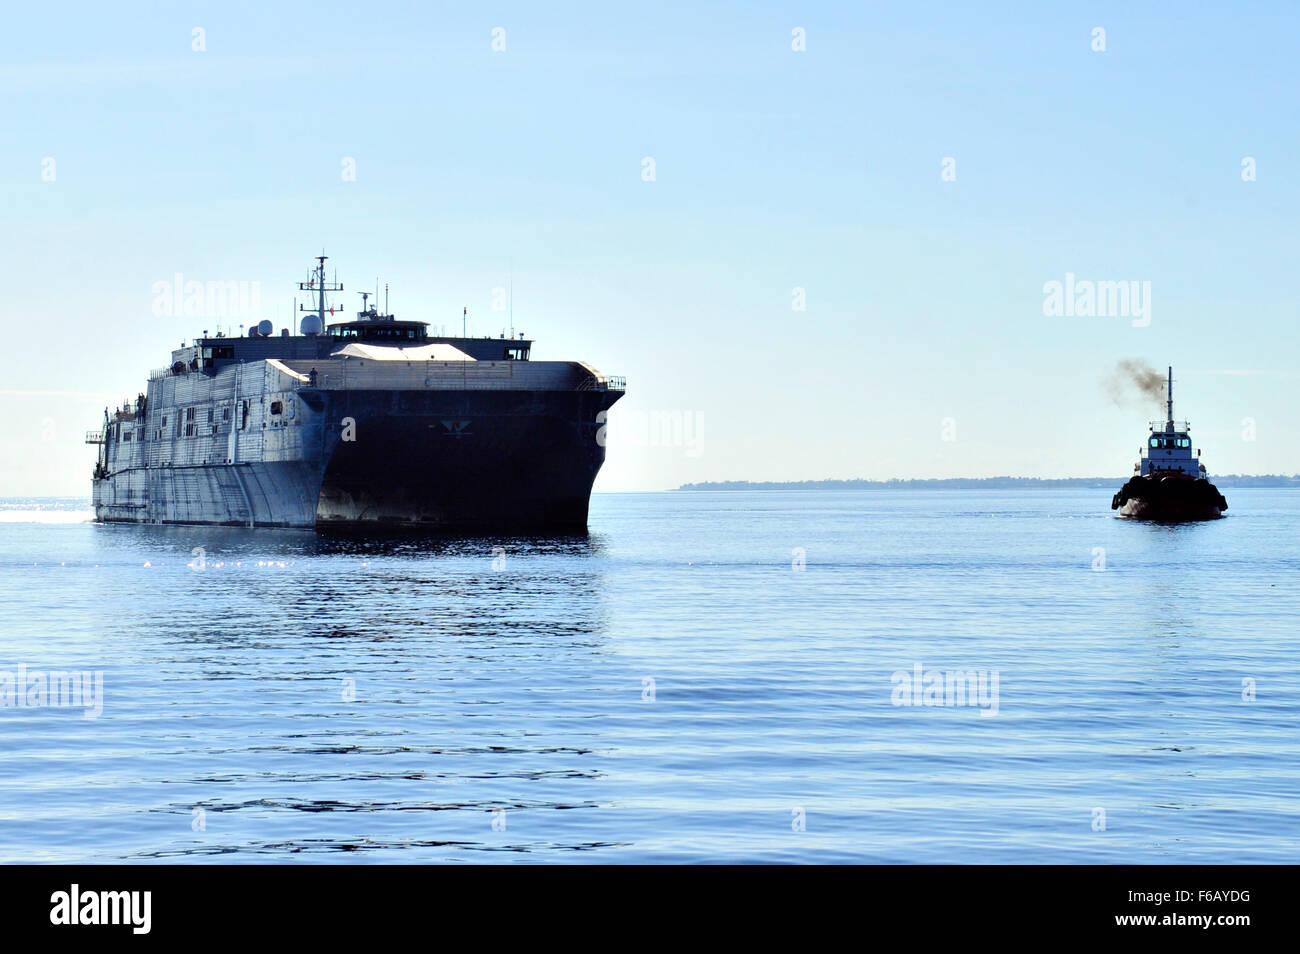 150817-N-YF678-012 DA NANG, Vietnam (Aug. 17, 2015) – The Military Sealift Command joint high speed vessel USNS - Stock Image